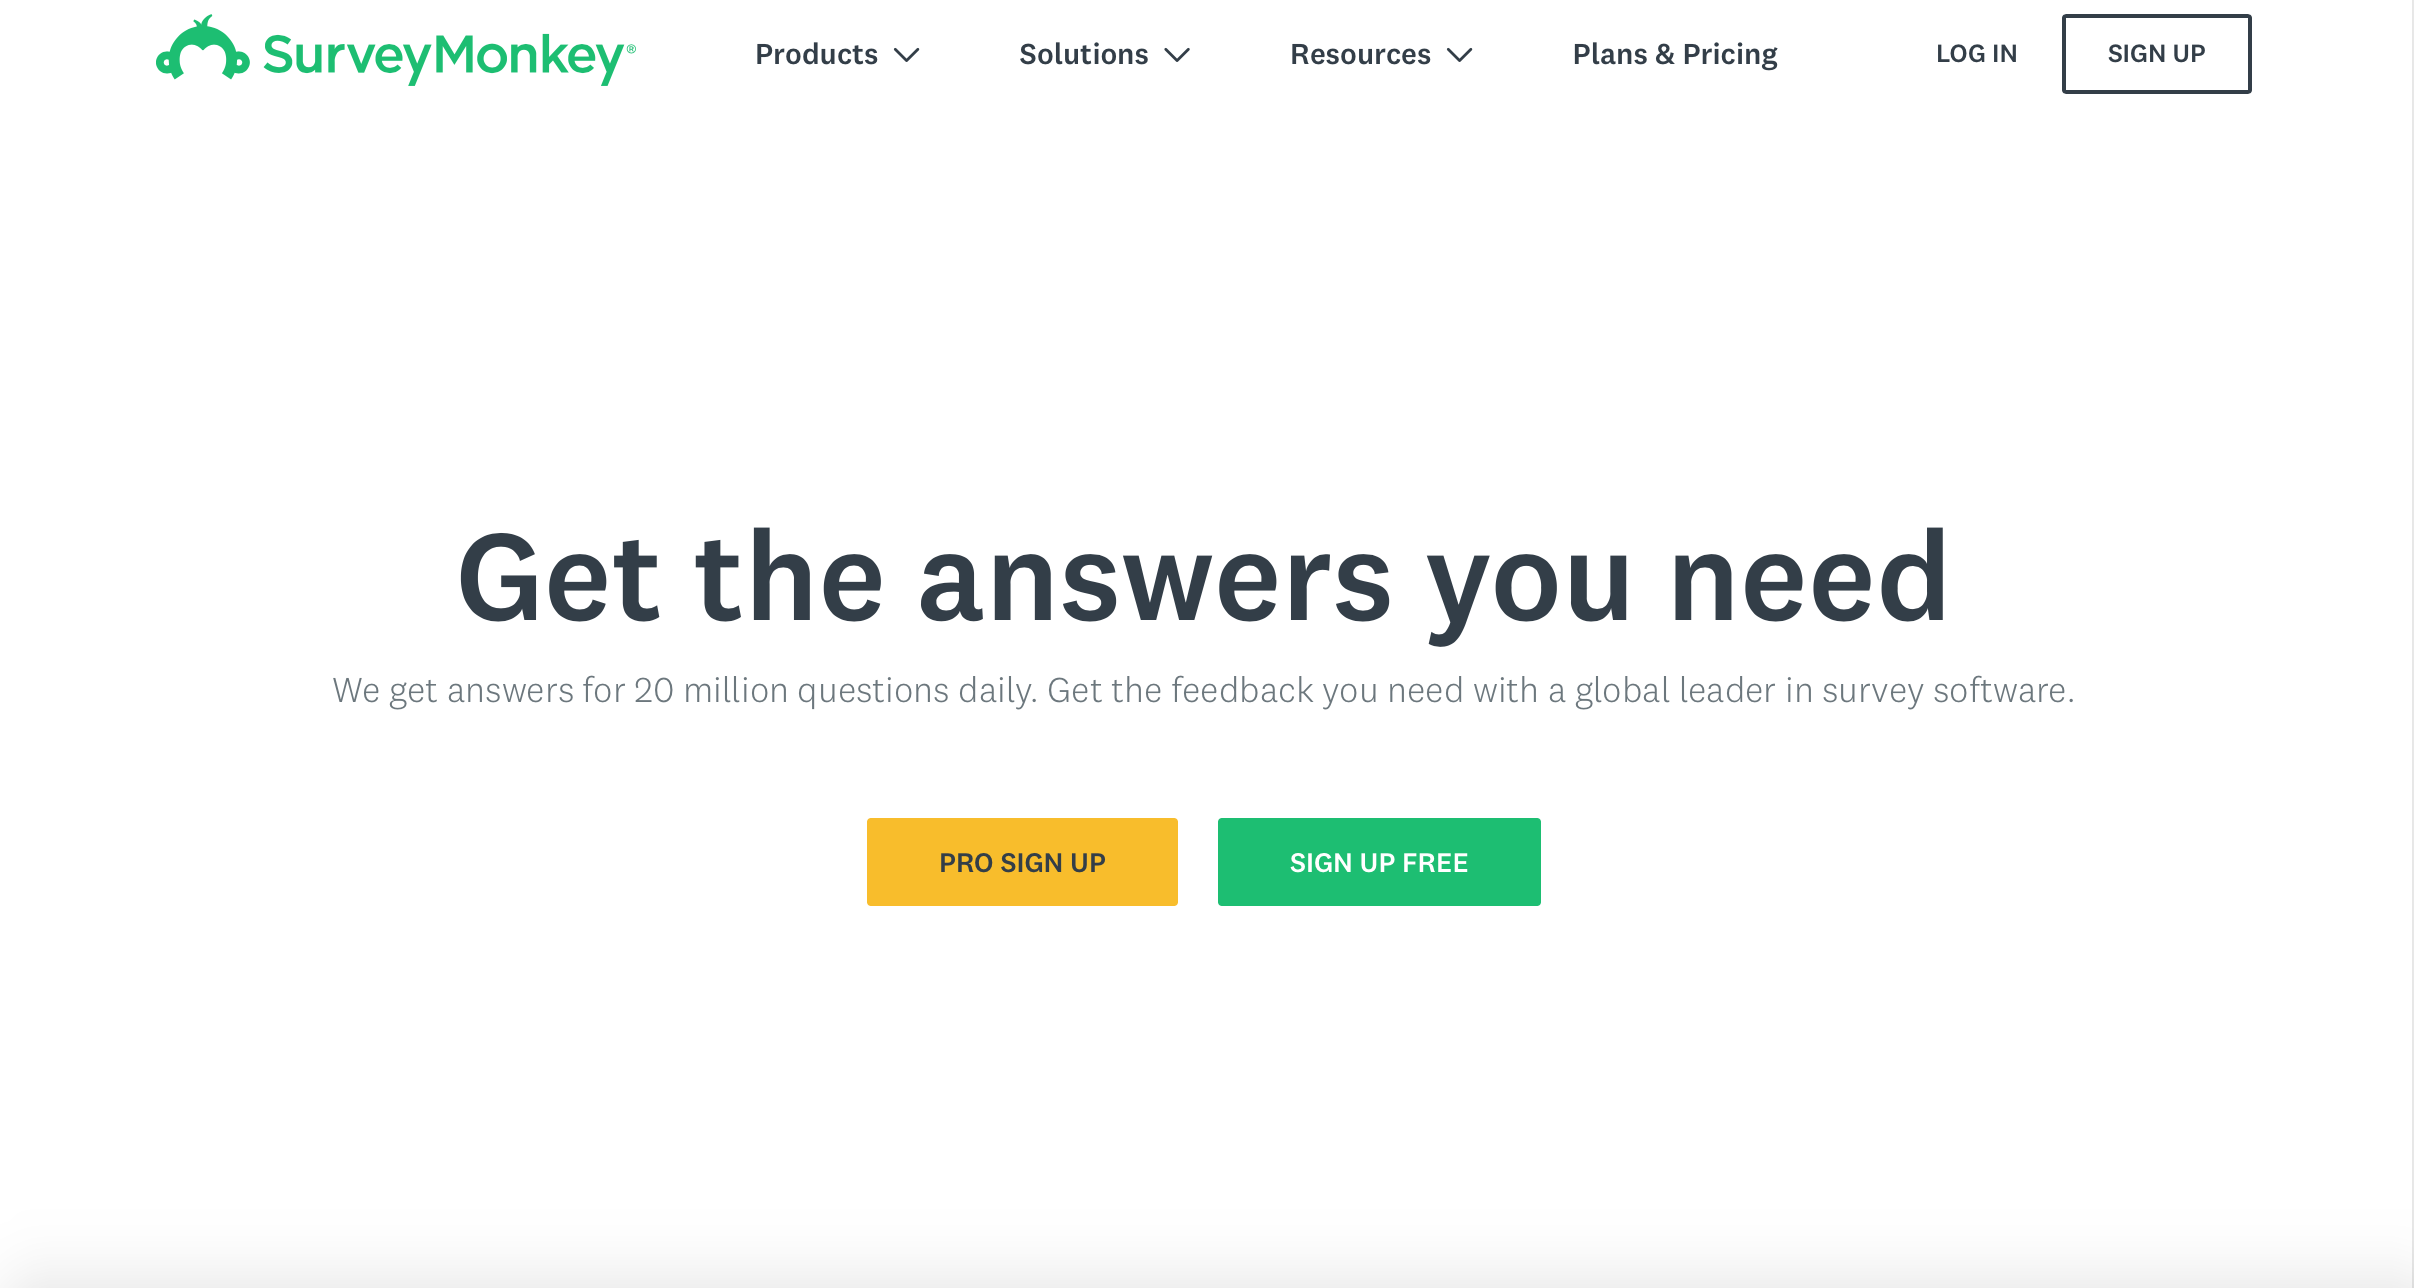 SurveyMonkey home page